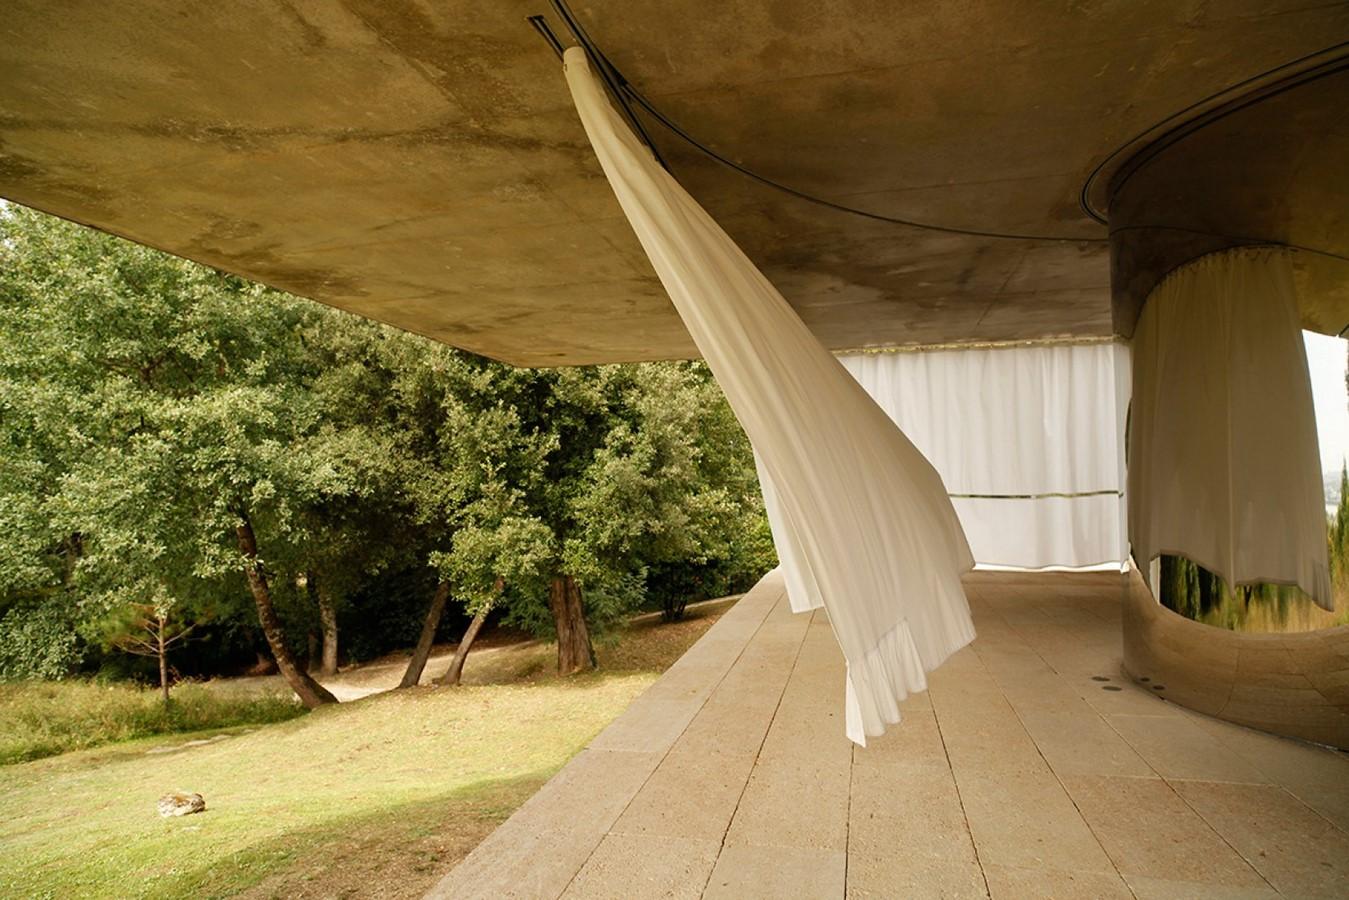 Maison Bordeaux by Rem Koolhaas: The living house - Sheet10